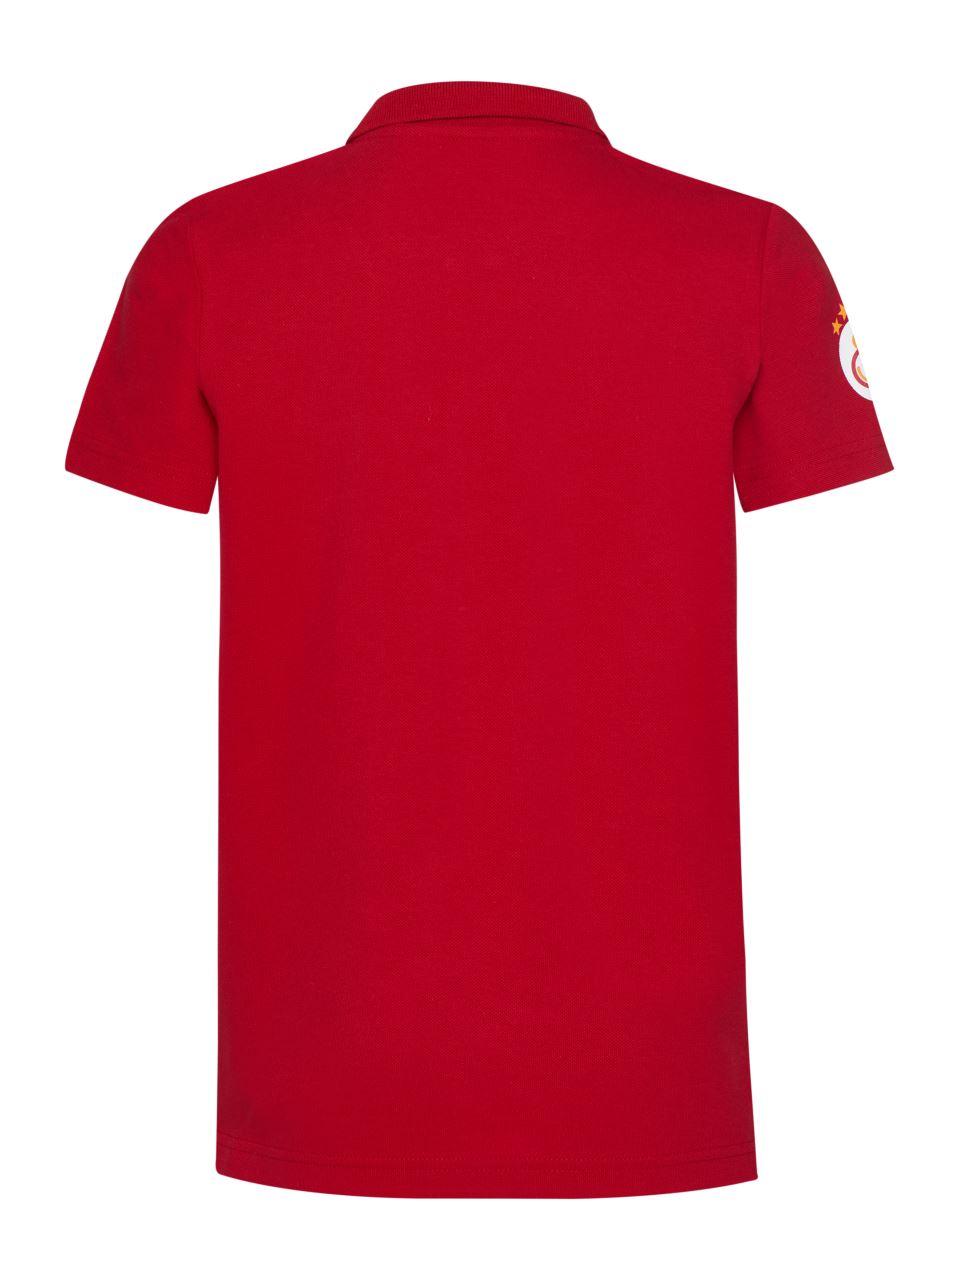 C95336 Polo Yaka T-shirt (GS 005)